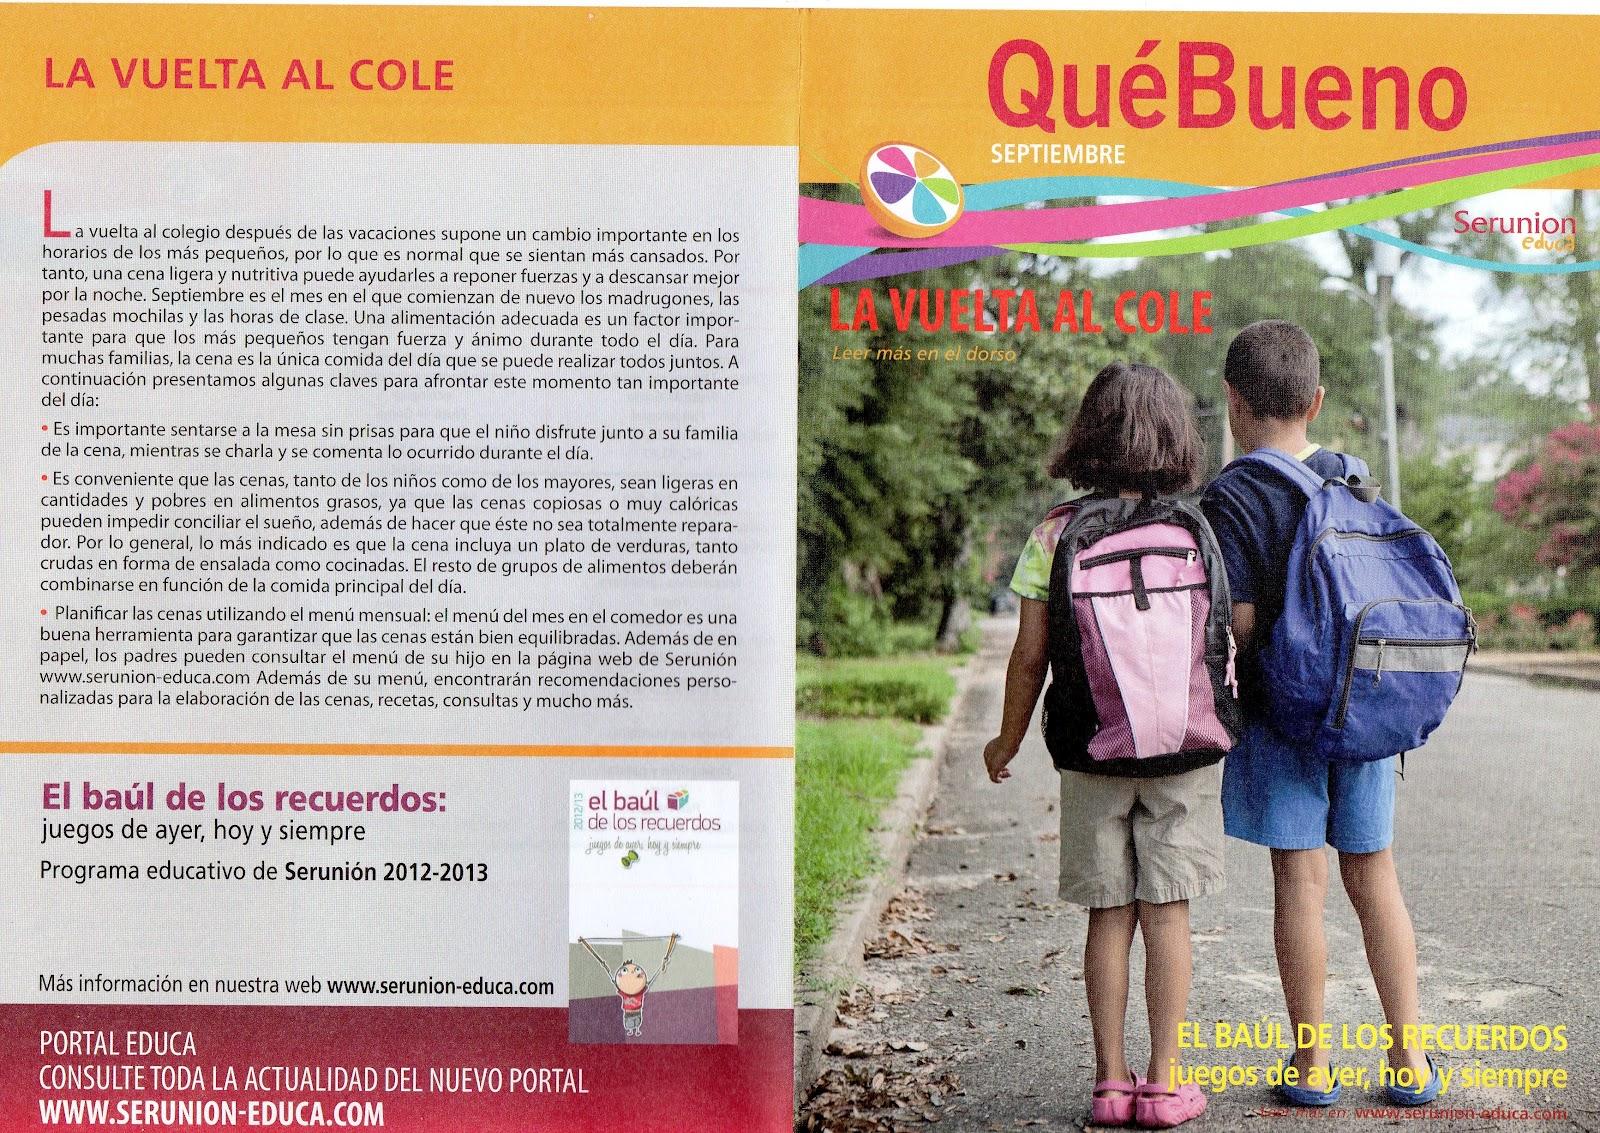 Ampa angelo roncalli septiembre 2012 for Sala fundicion programacion